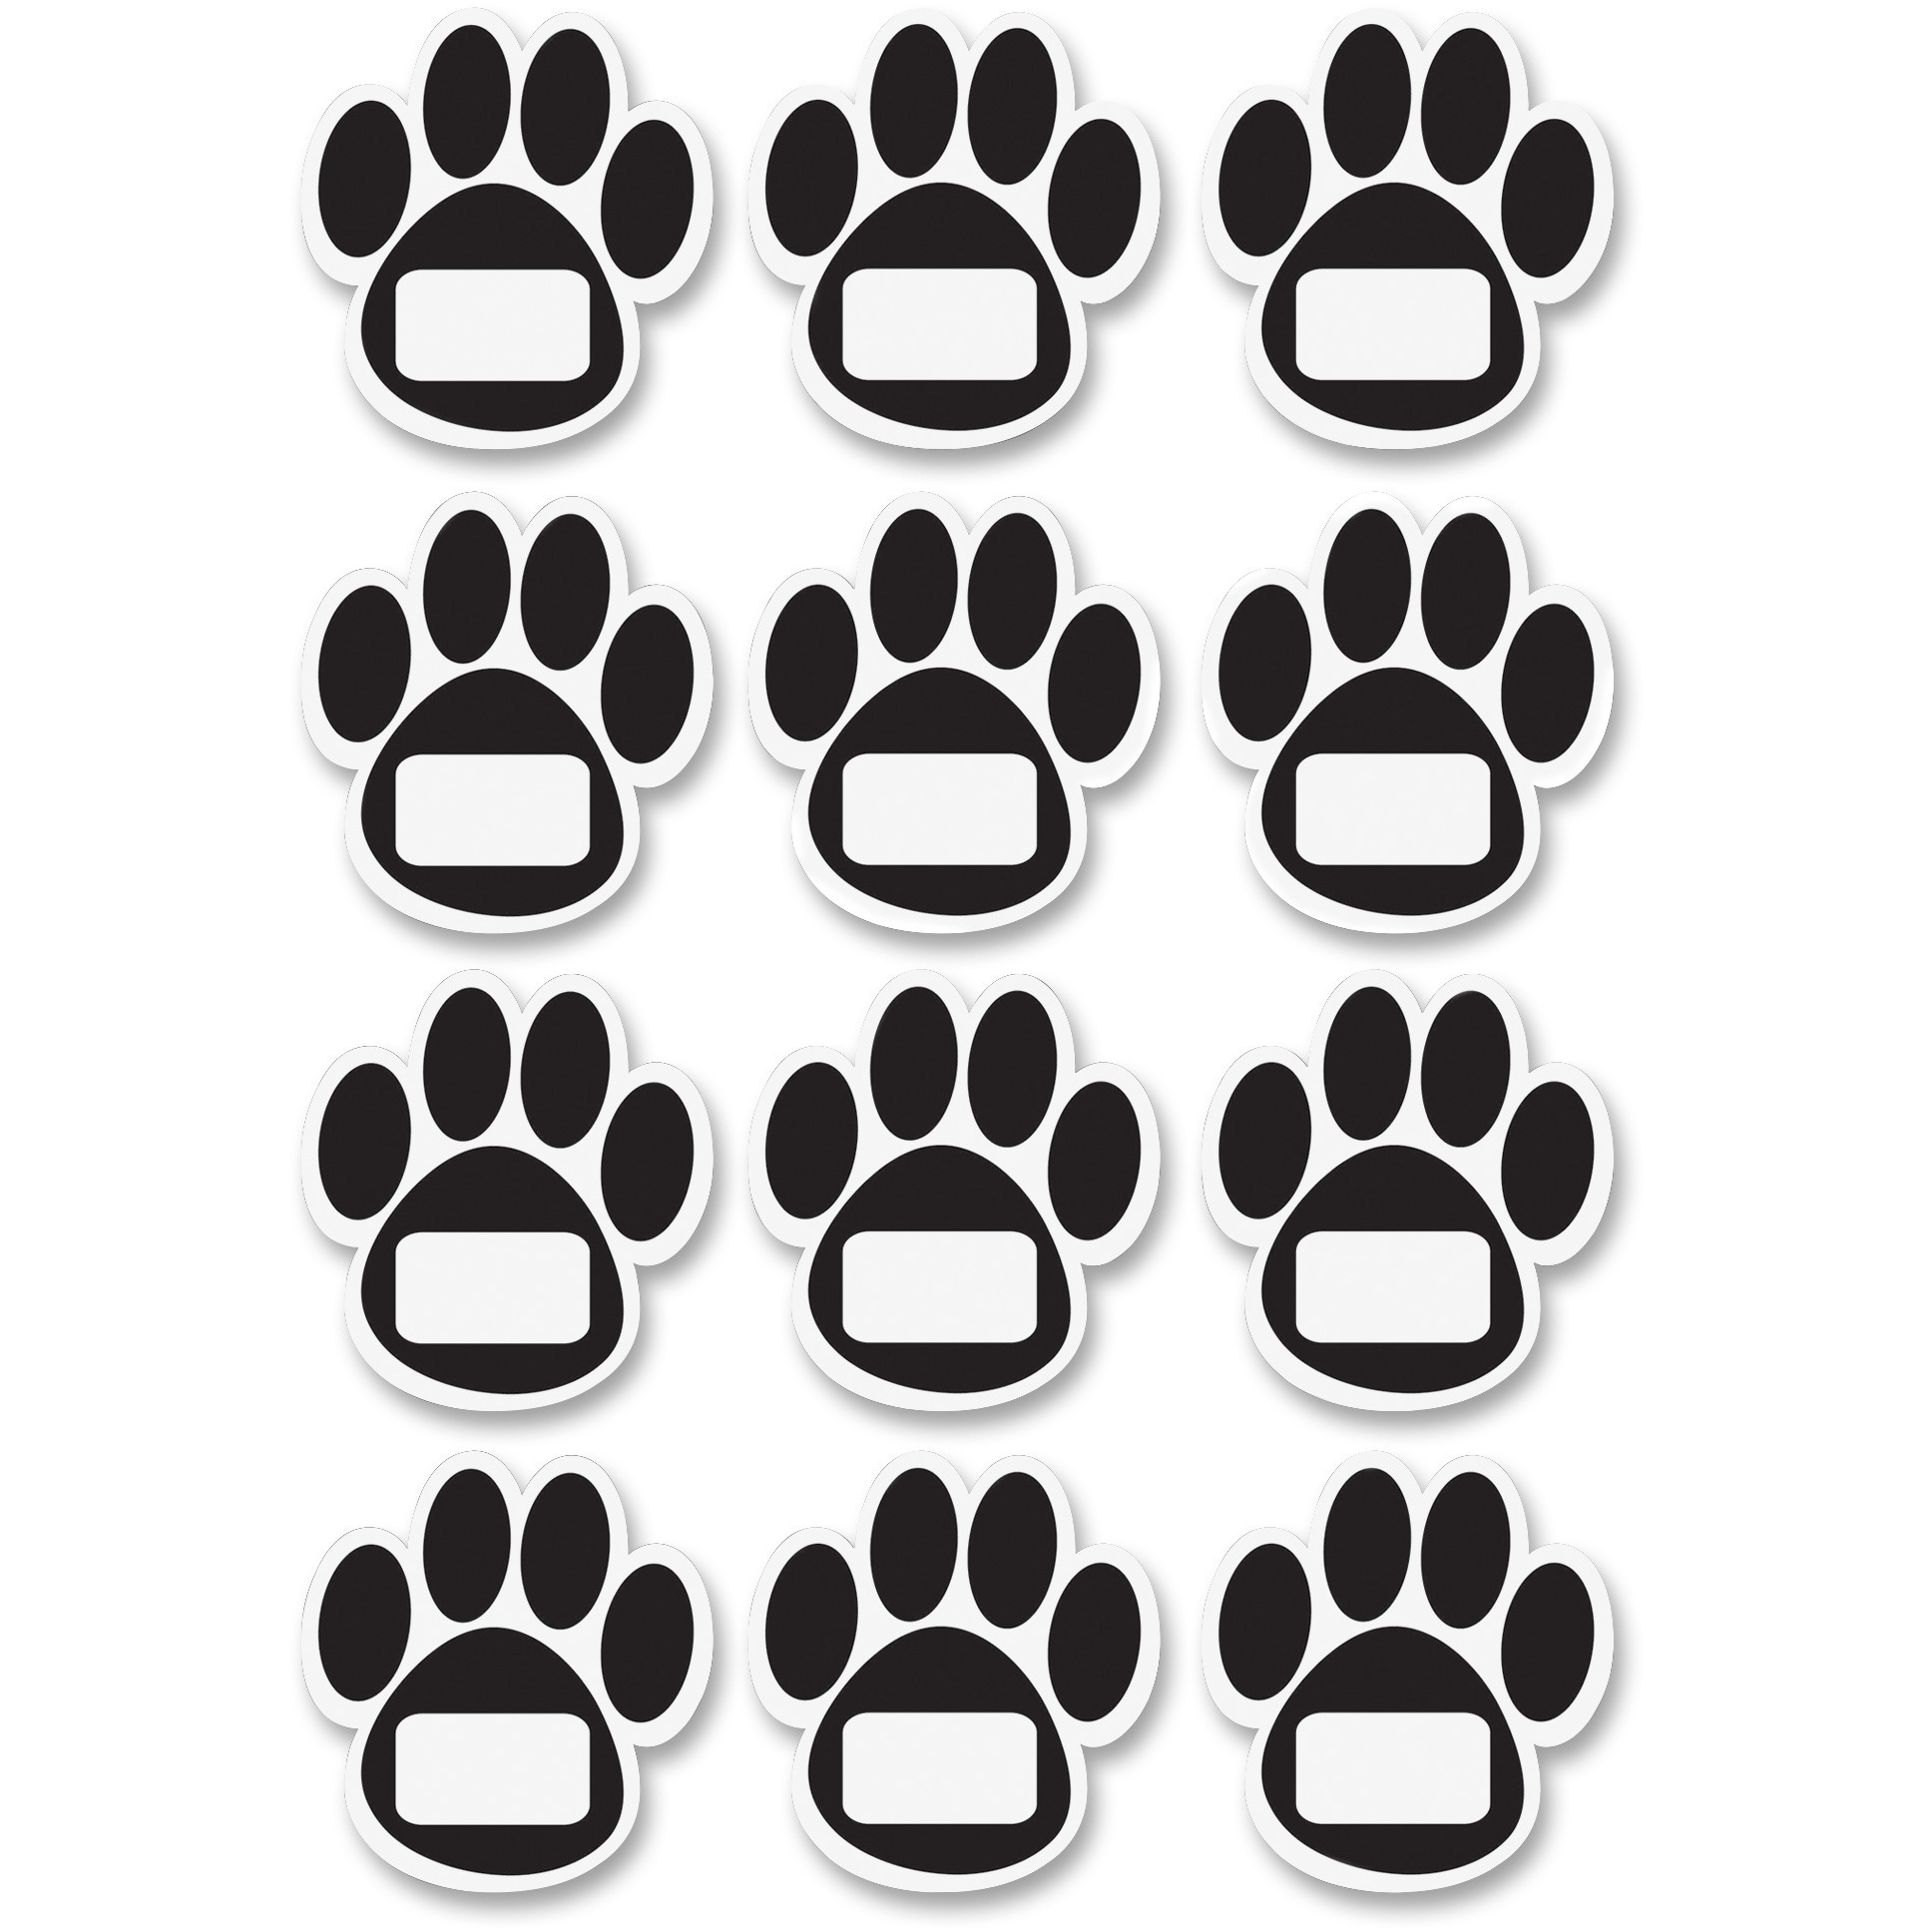 Ashley, ASH10104, Paw Design Dry-erase Magnets, 1 Set, Black,White